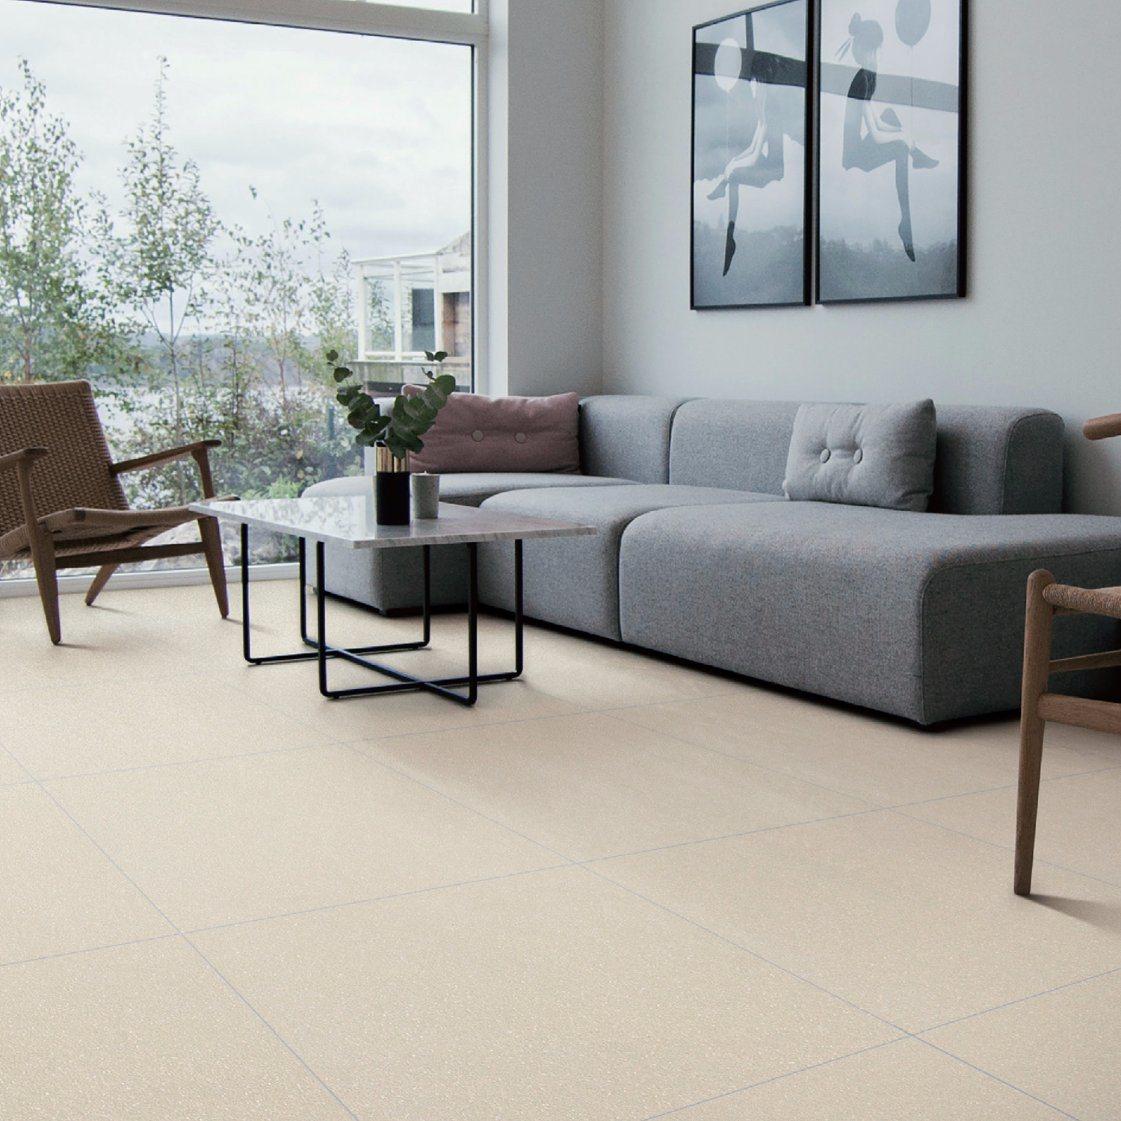 Kết quả hình ảnh cho beige tiled bedroom